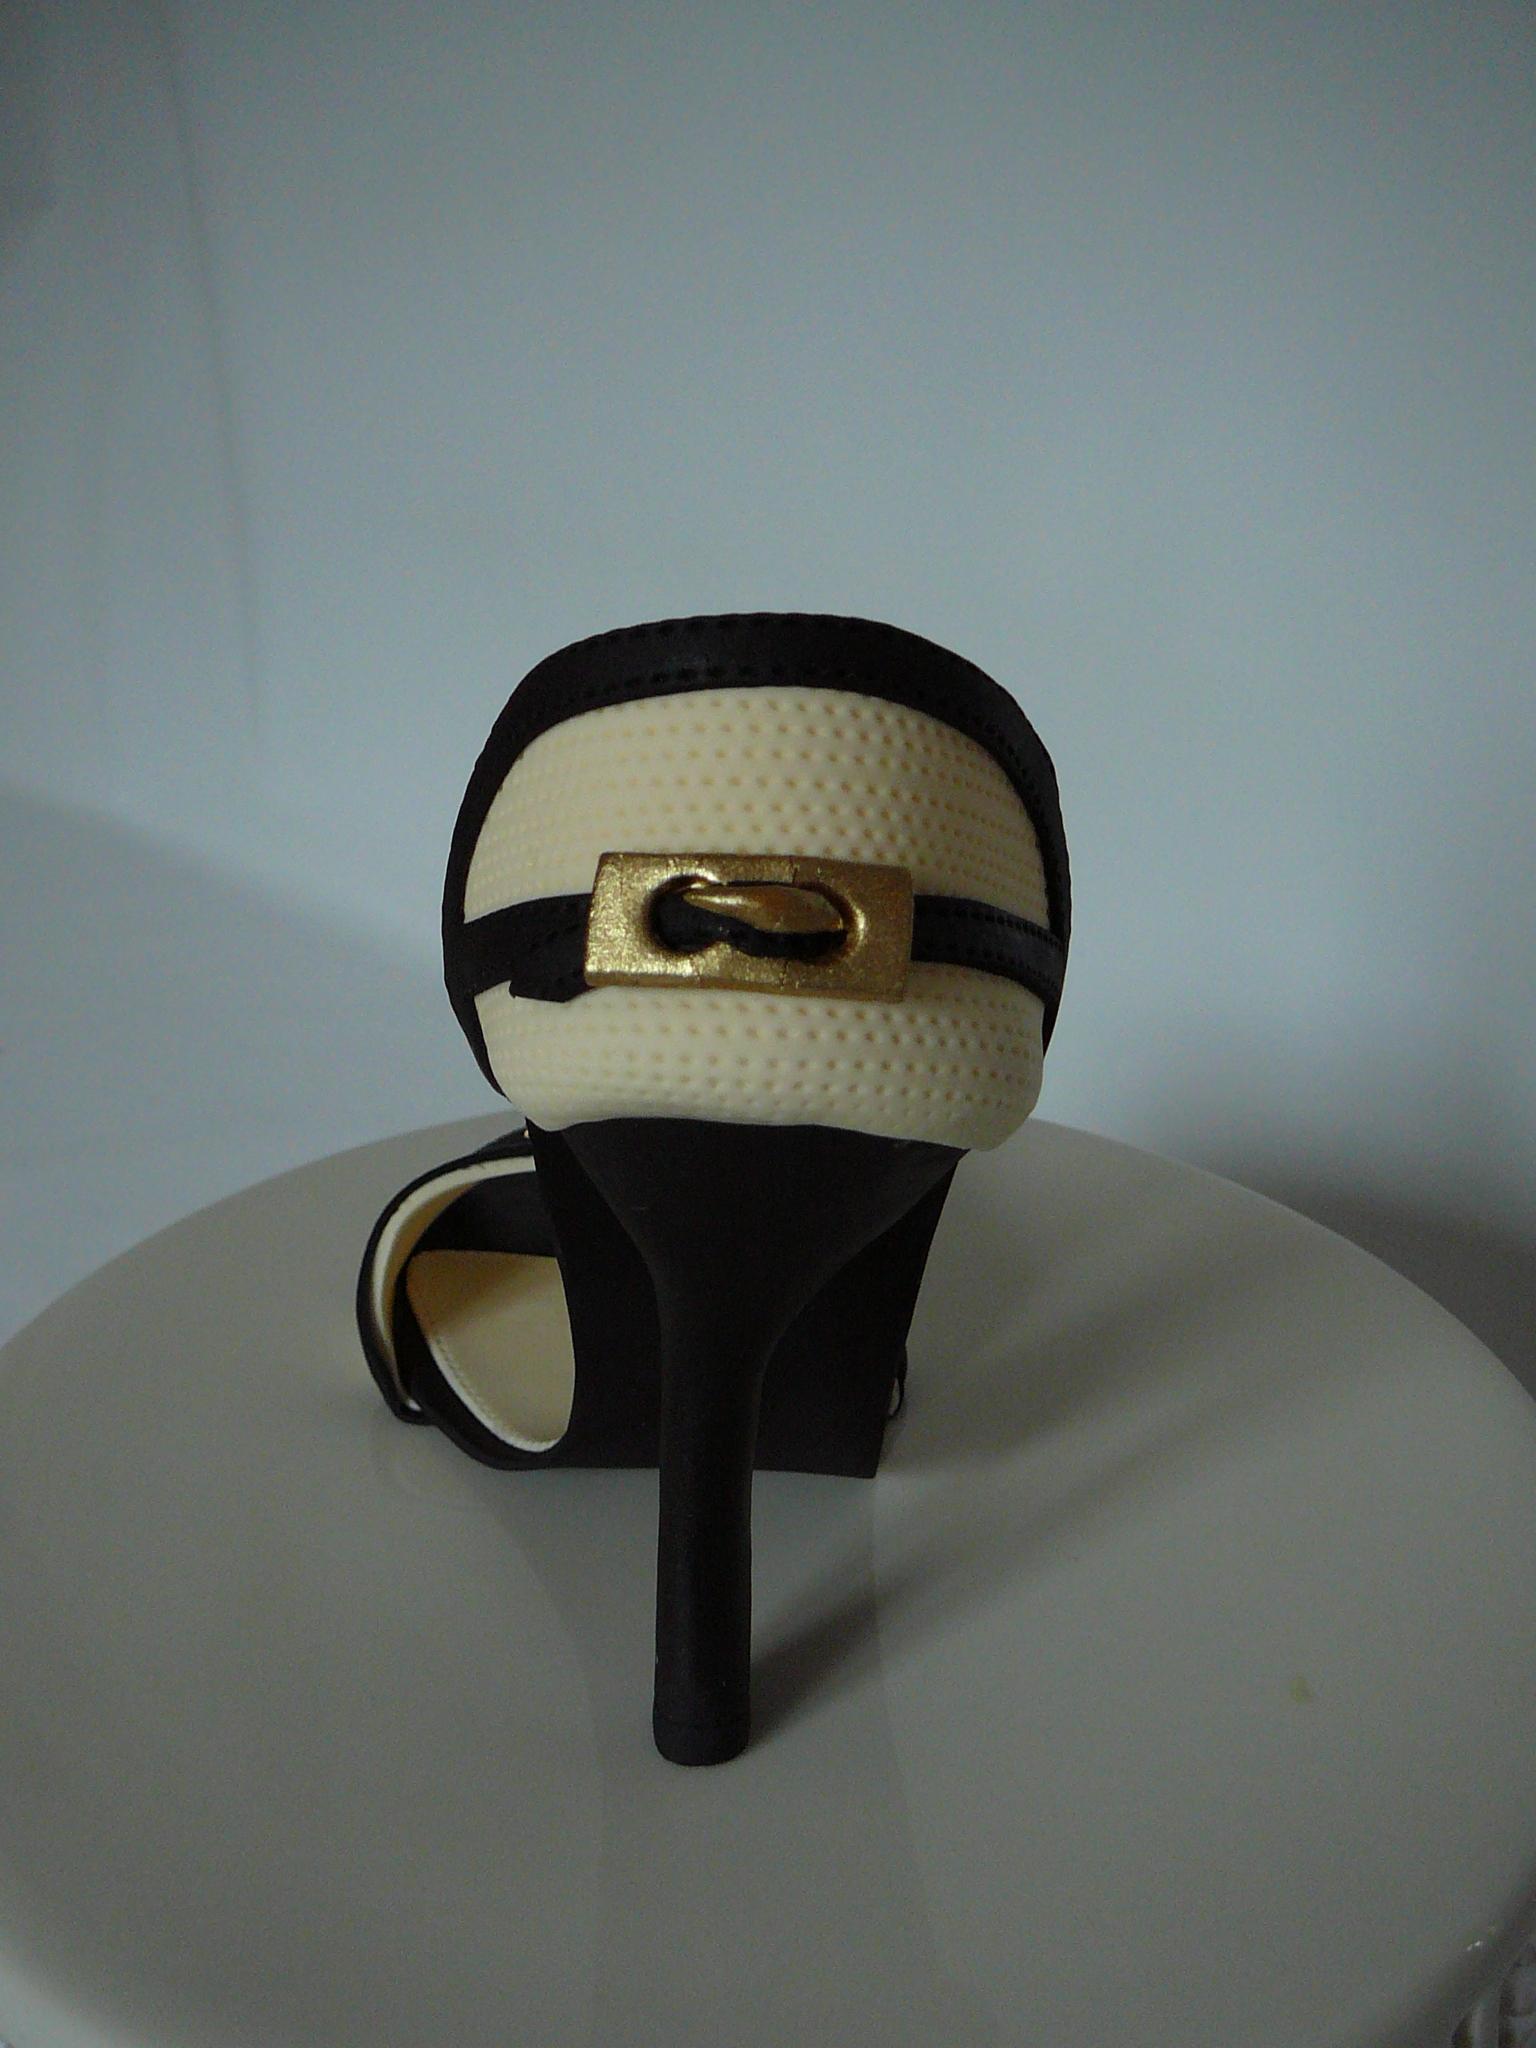 louis vuitton high heel shoe cakecentral